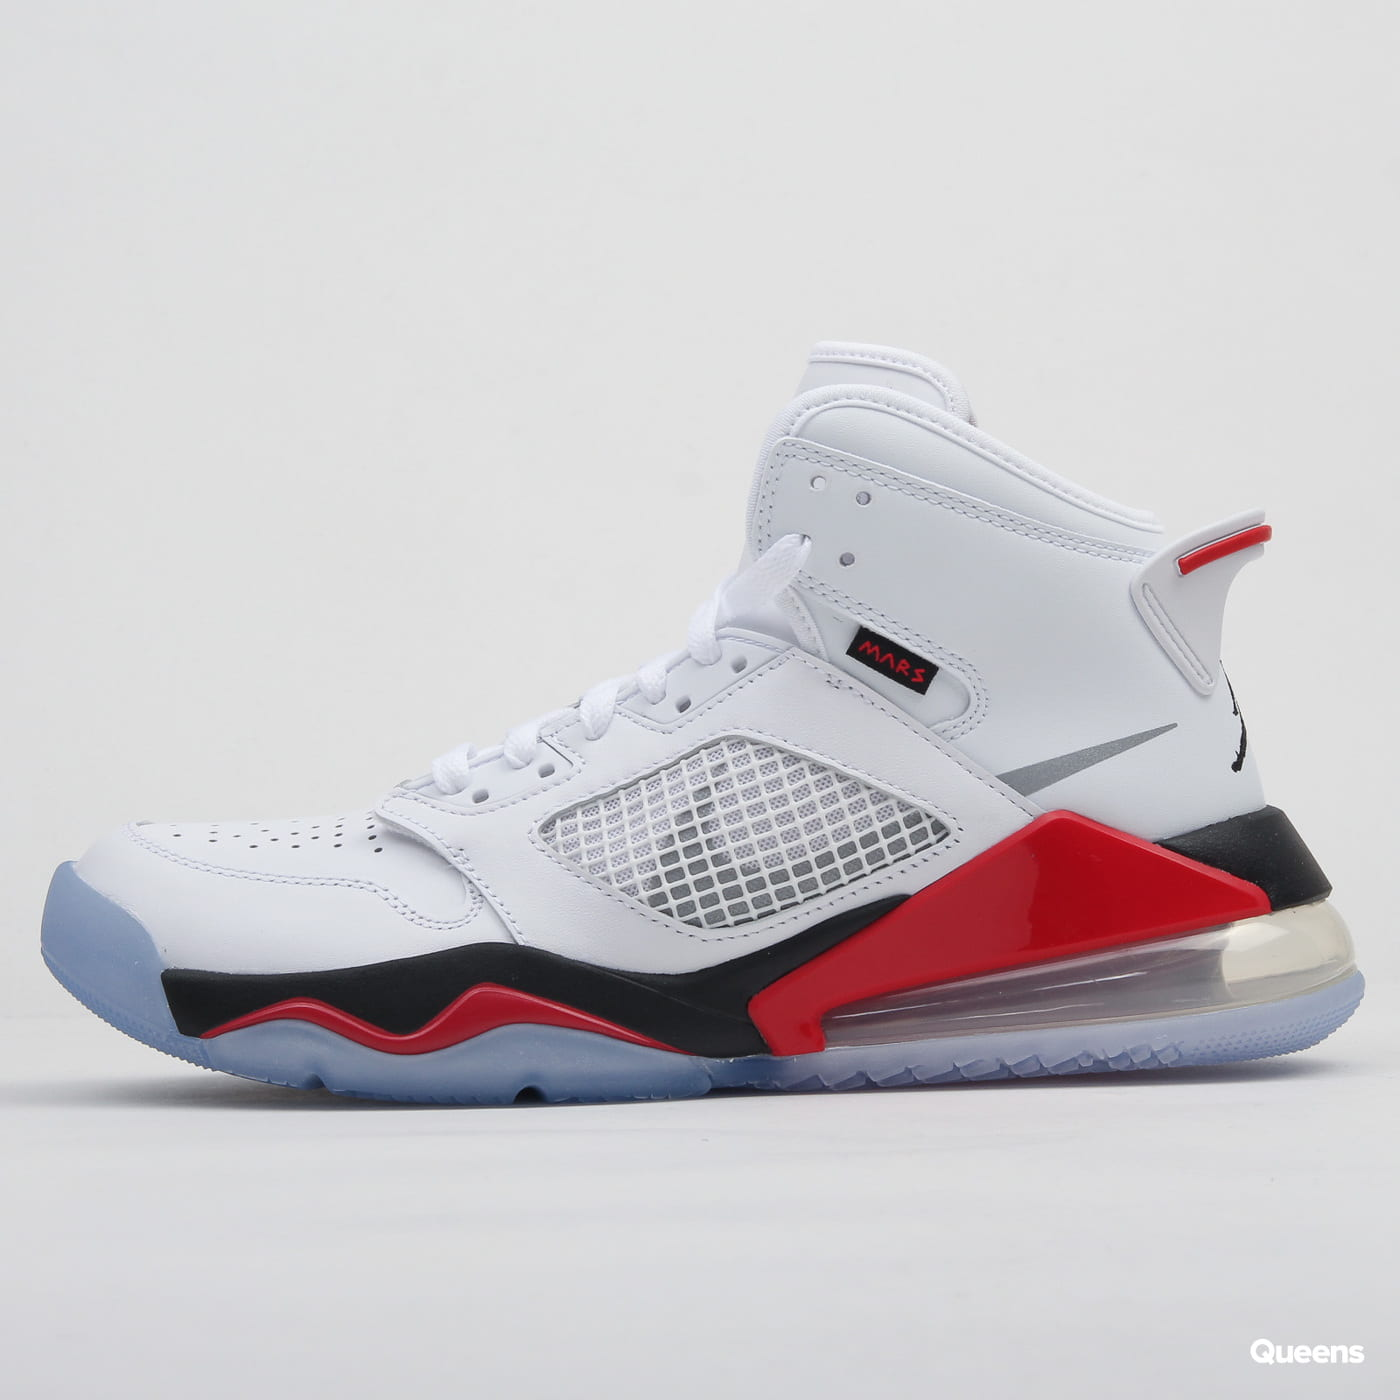 Jordan Mars 270 white / reflect silver - fire red